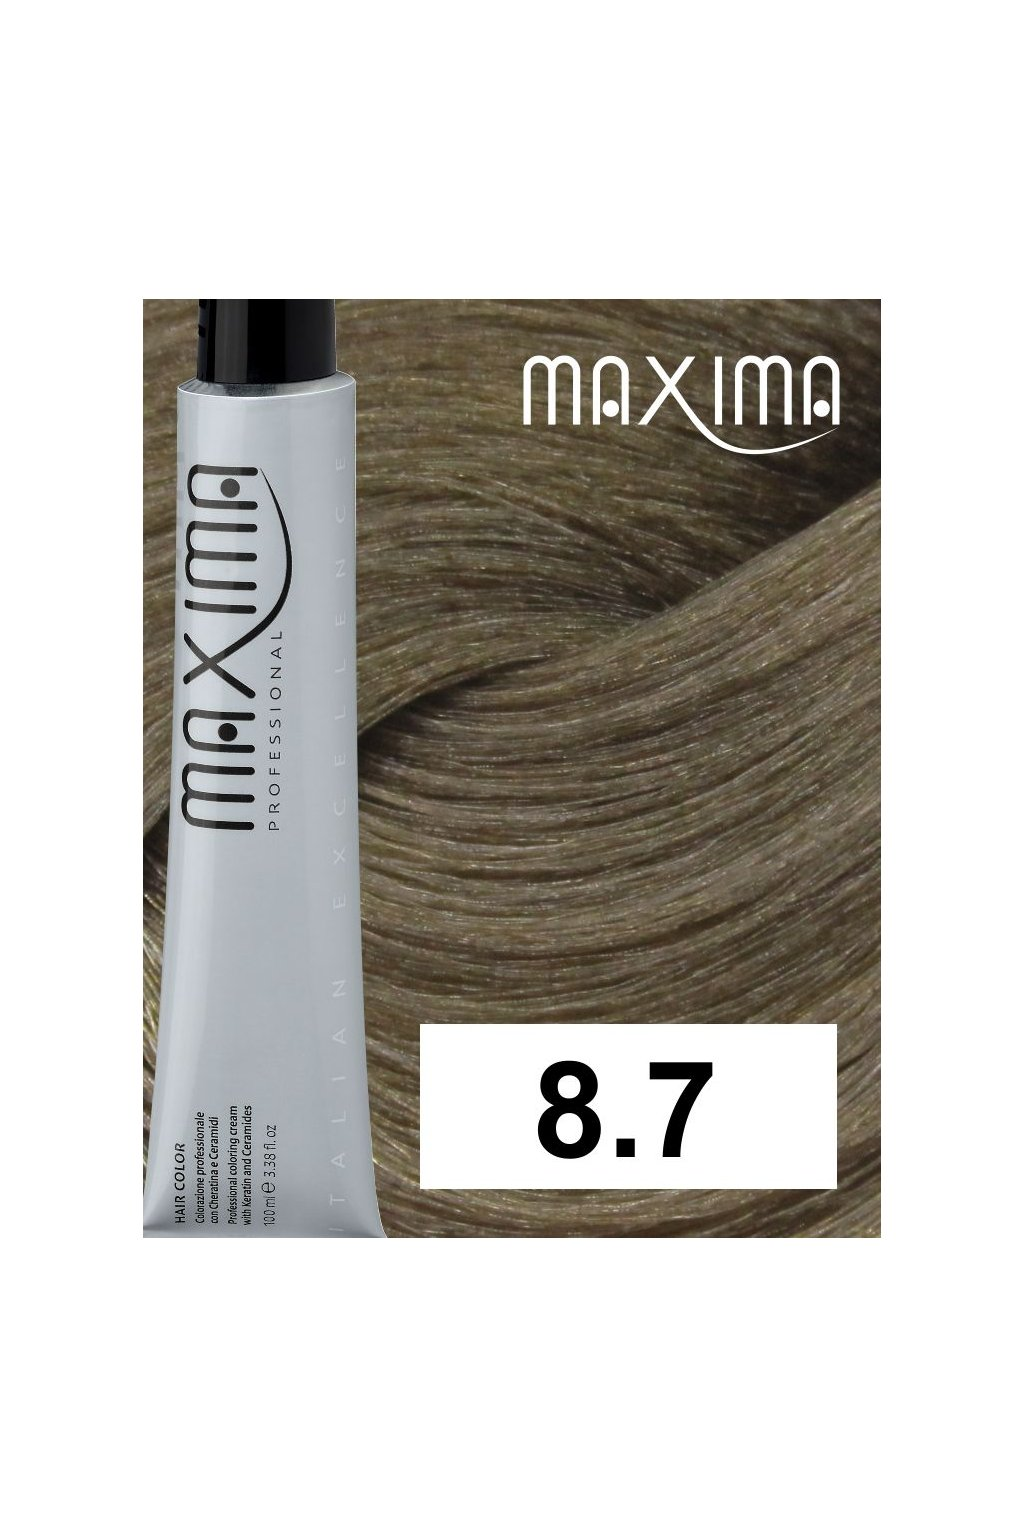 8 7 max